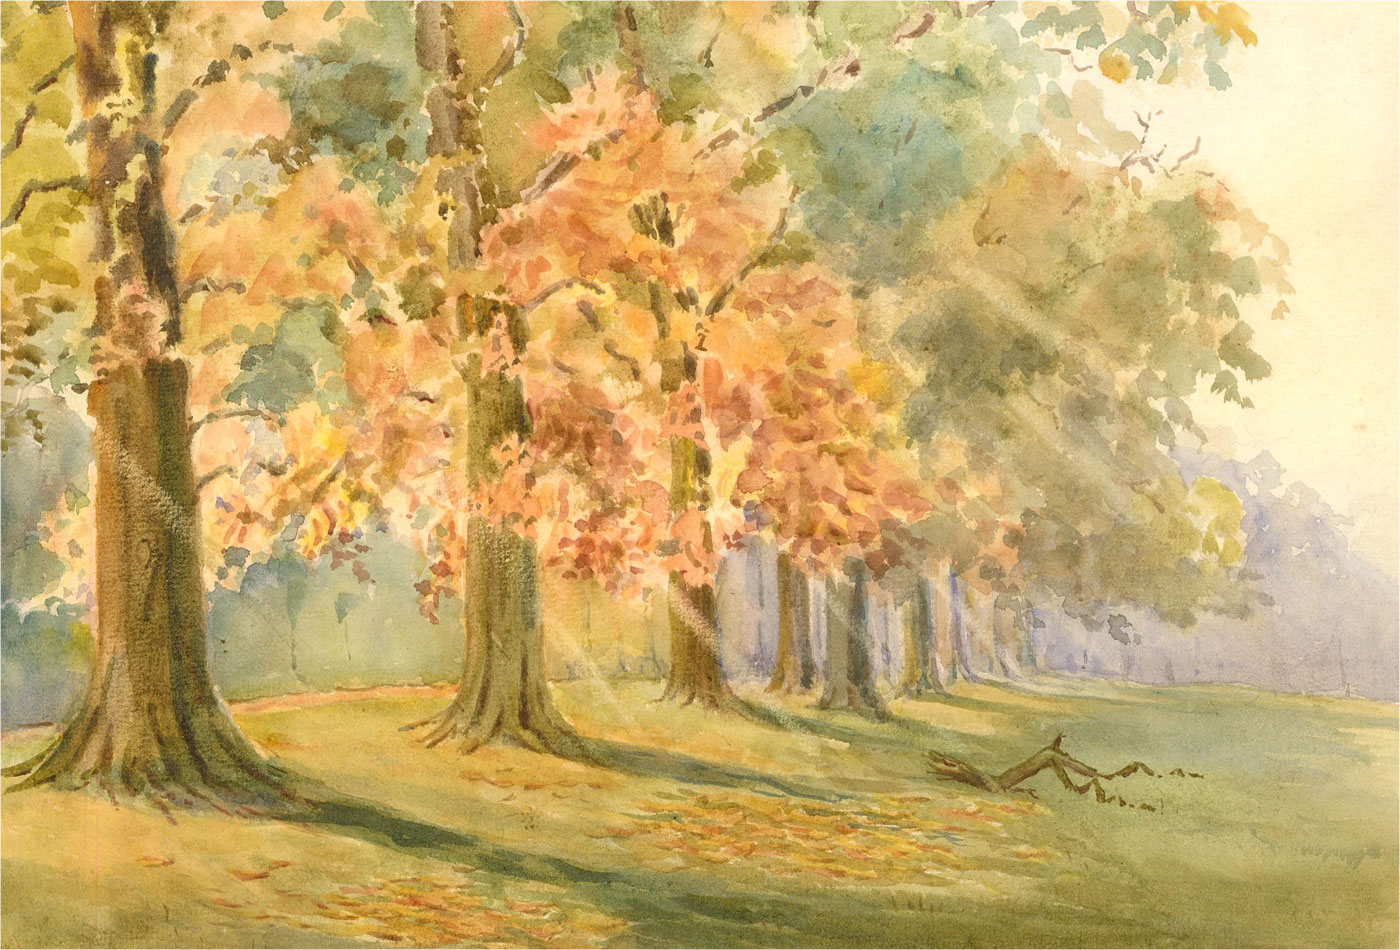 Raymond Turner Barker (1872-1945) - 1913 Watercolour, November Sun